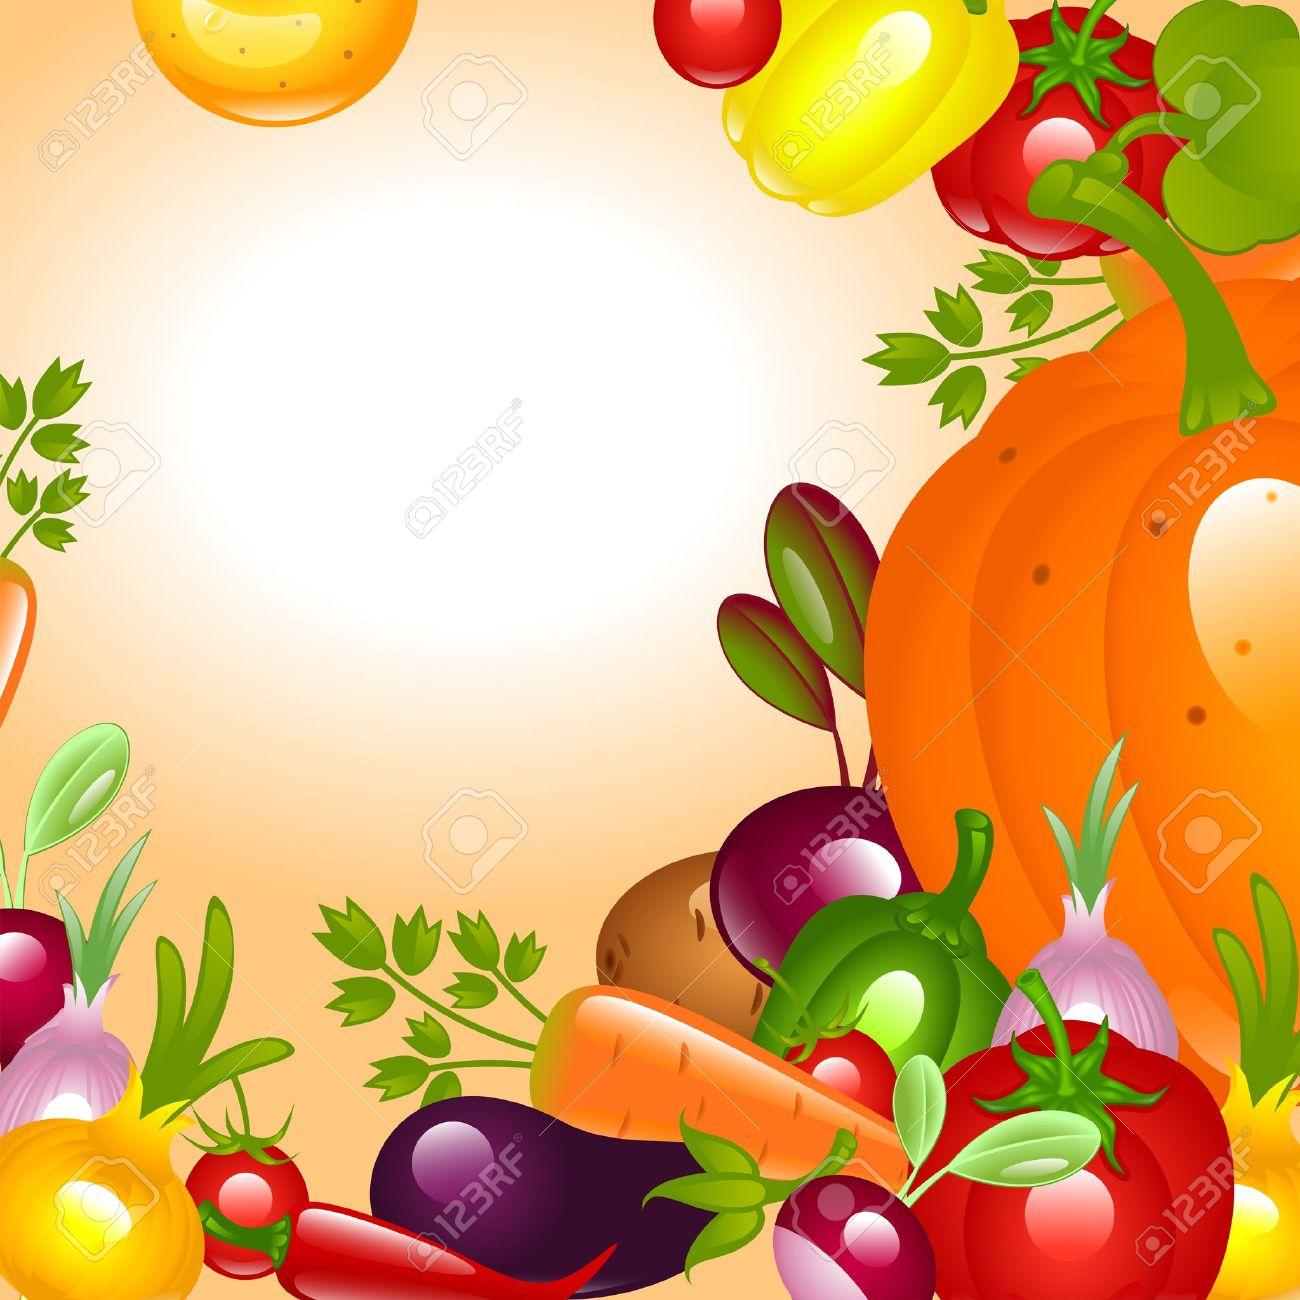 Vegetables Clipart Background.